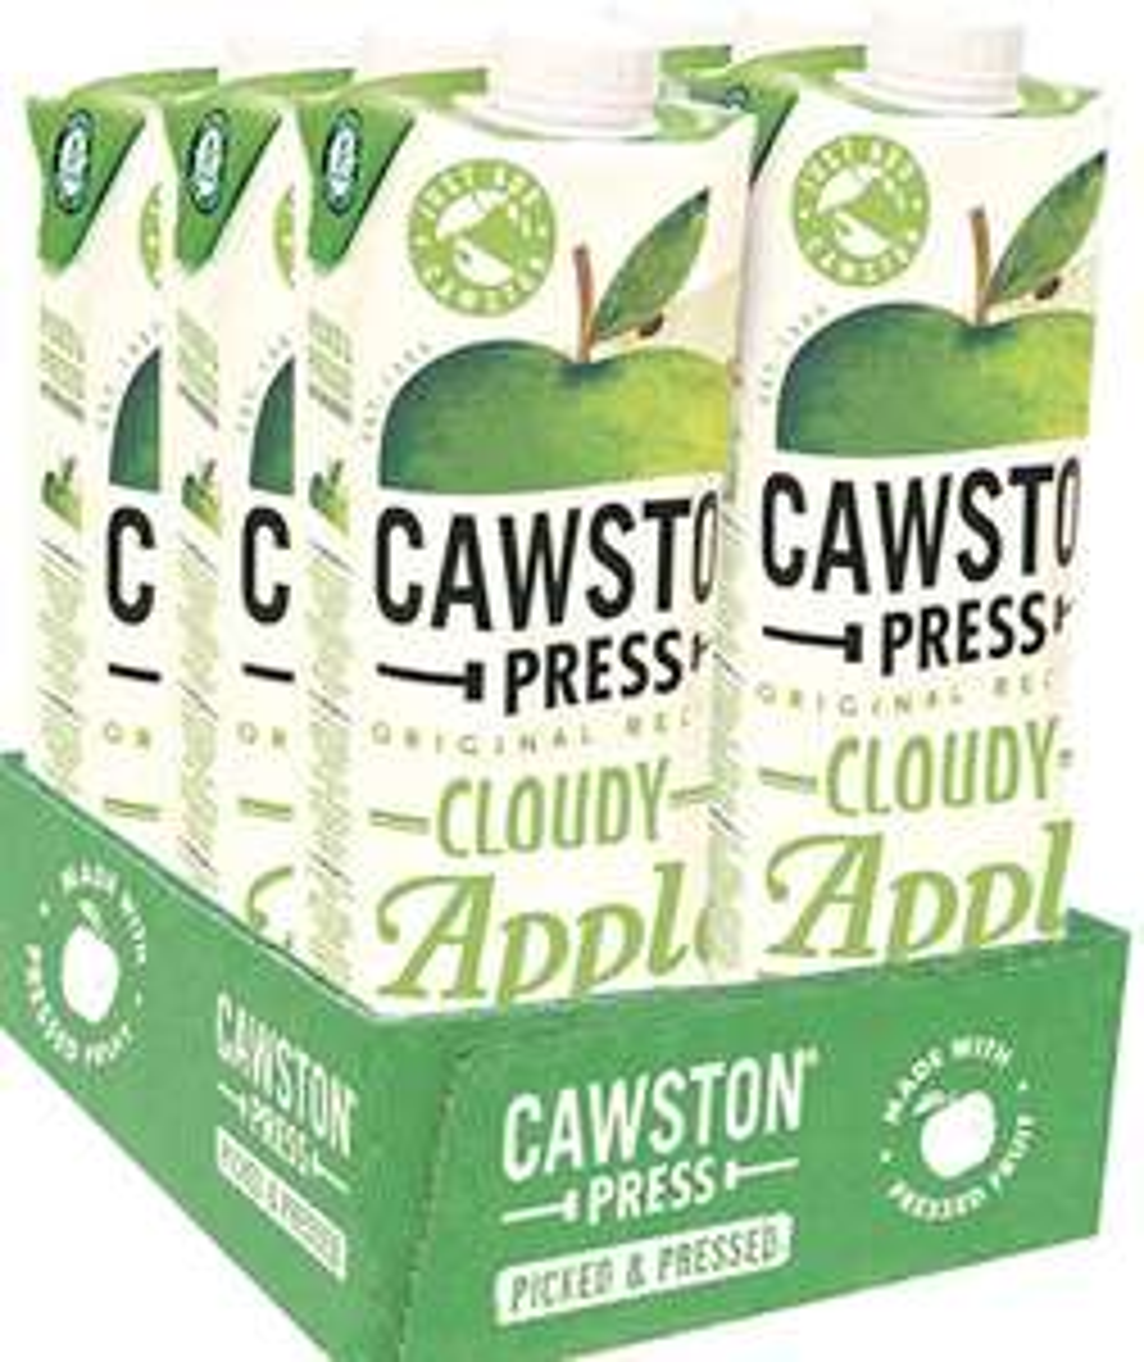 Cawston Press Cloudy Apple Pressed Juice, 1 l, Pack of 6 - £6.32 (+£4.49 Non-Prime) @ Amazon